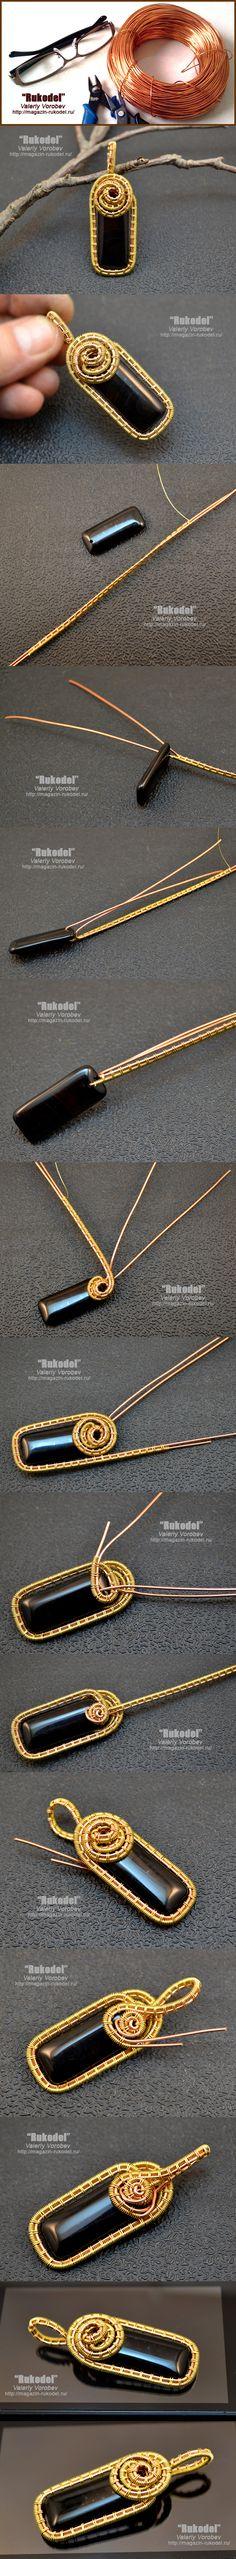 Рукодел. Wire wrap Pendant on Vorobev. Wire wrap tutorial. Go to the blog Rukodel - http://magazin-rukodel.ru/ #Rukodel, #Vorobev, #handmade, #wirewrap, #wirejewelry, #wirewrapped, #Jewelry, #tutorial, #WireWrapping, #Рукодел, #VikingKnit,